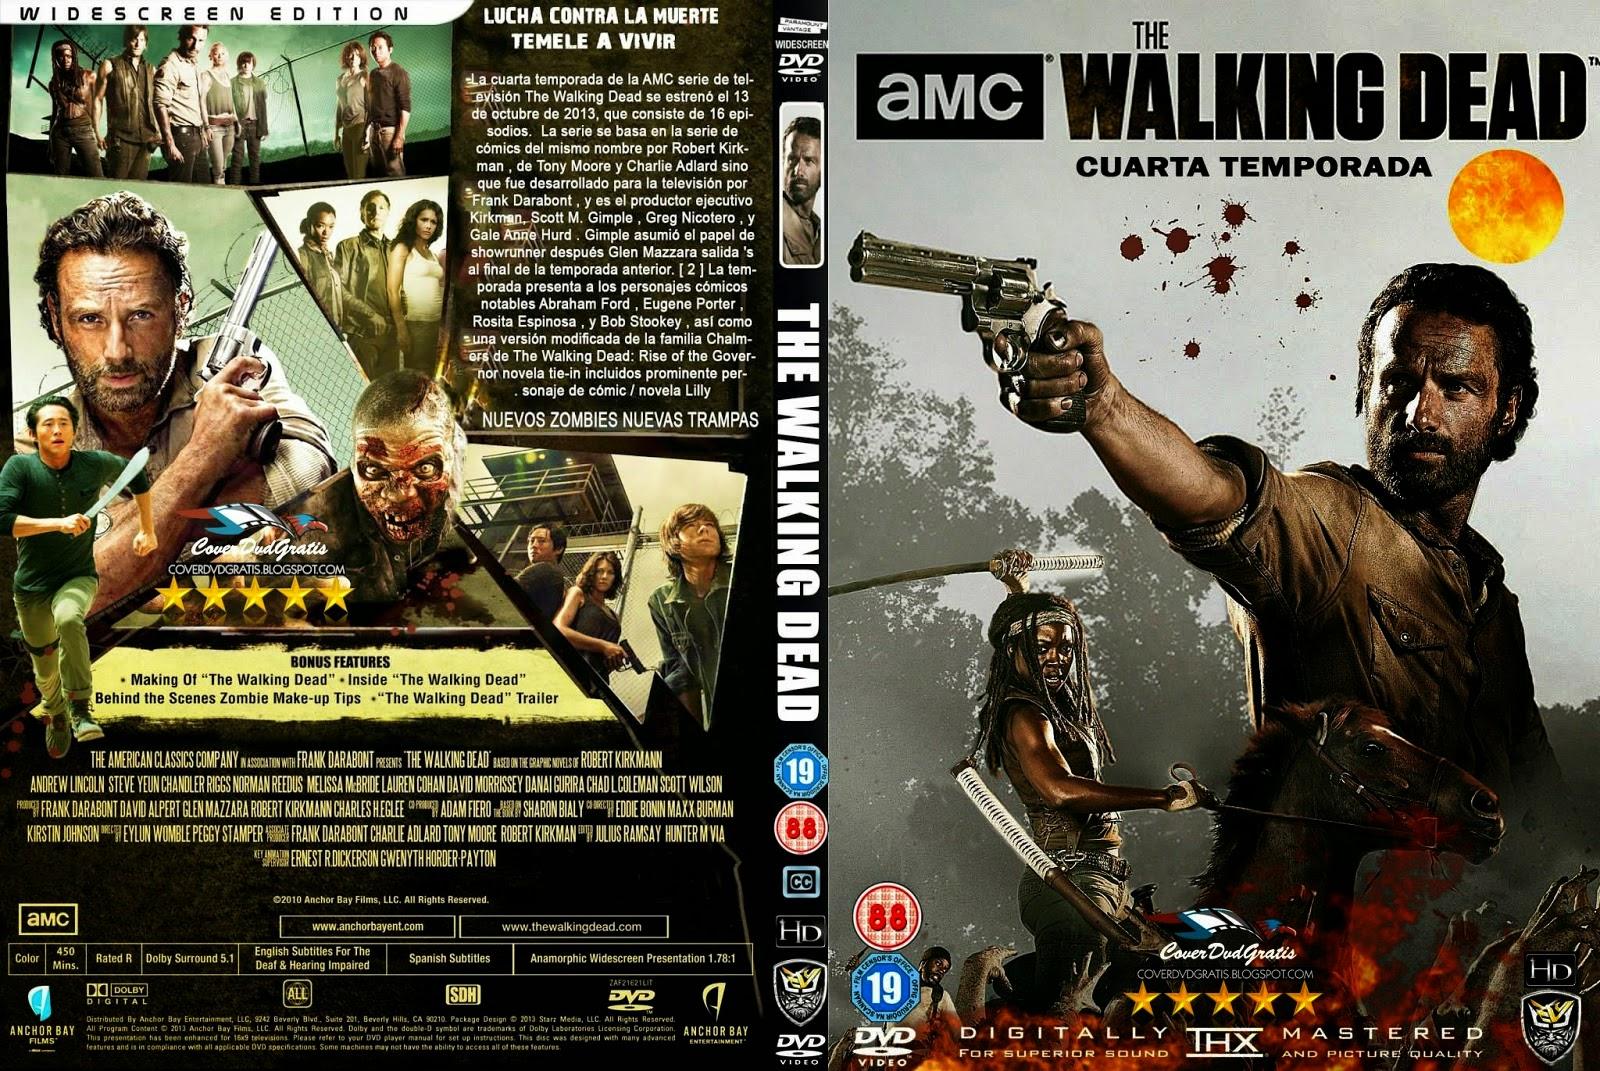 Tag; The Walking Dead Temporada 7 Online Español Seriespepito